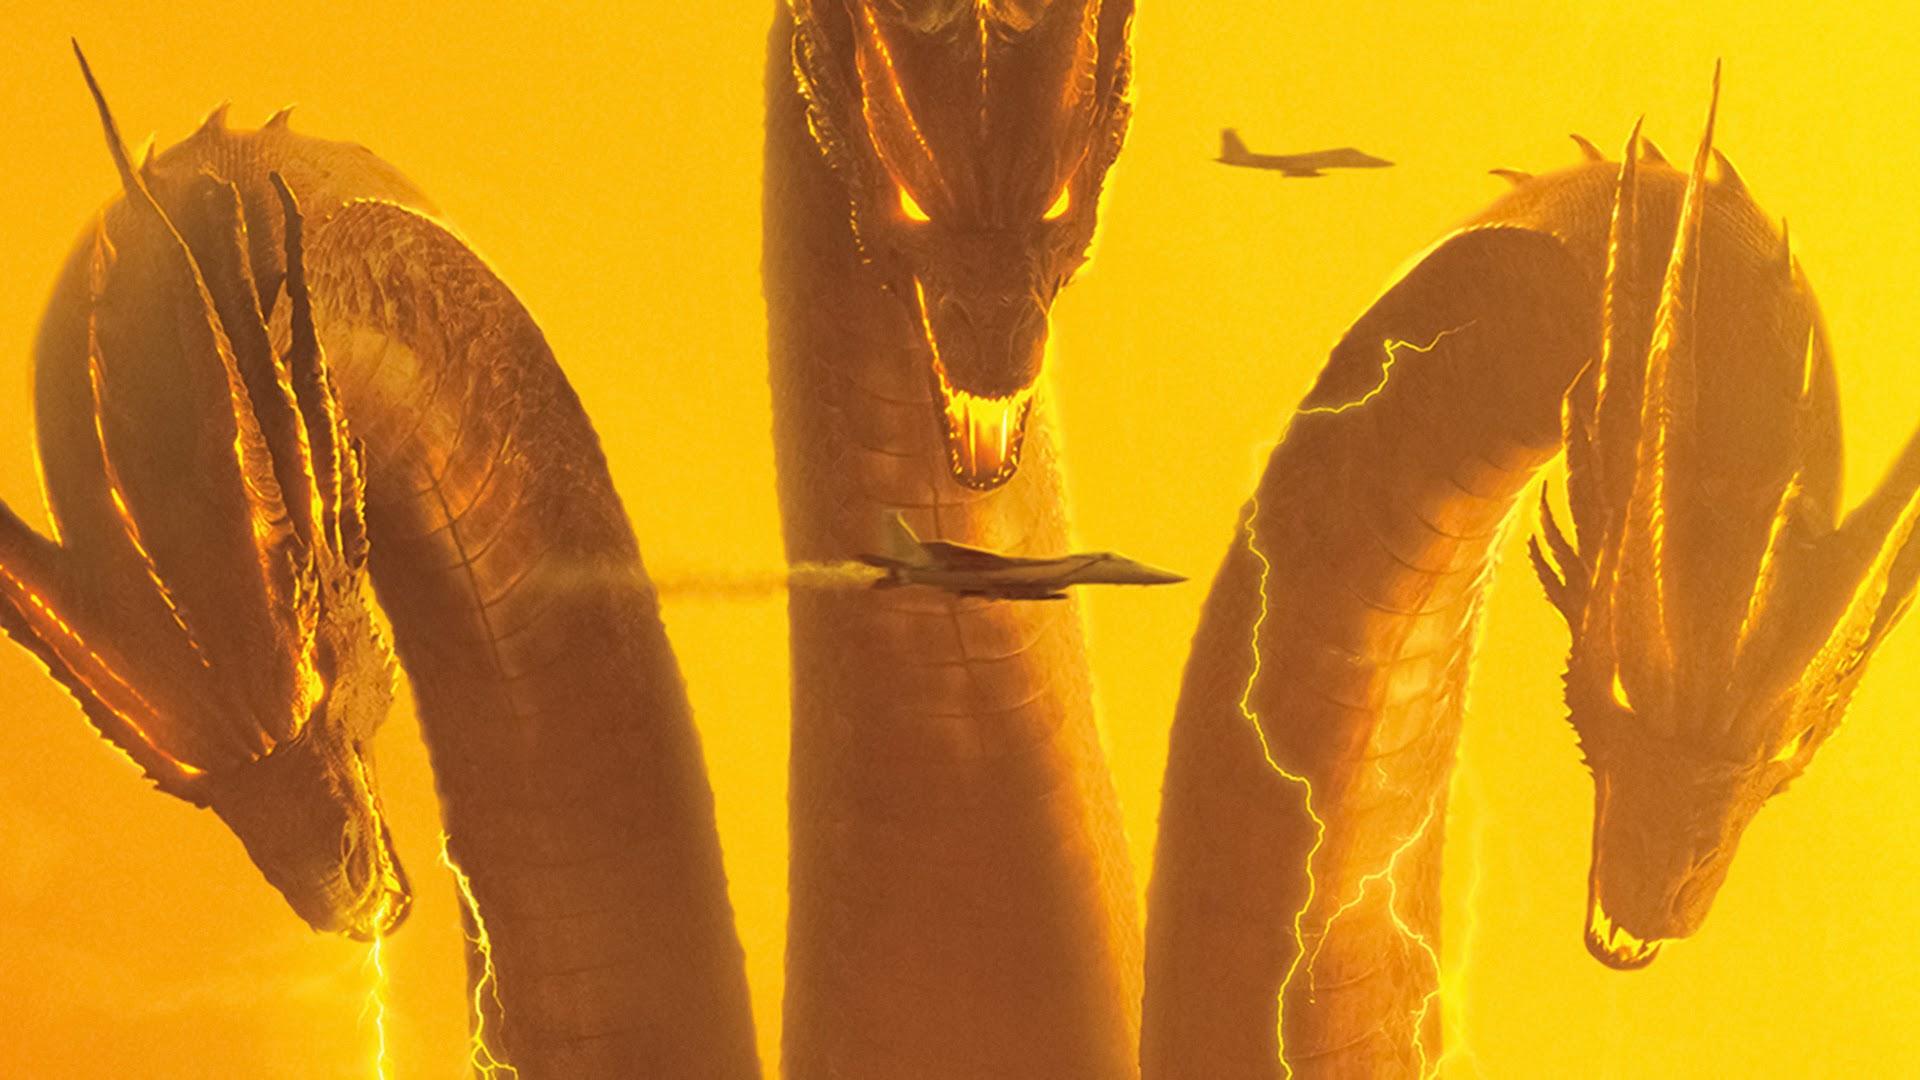 King Ghidorah, Godzilla: King of the Monsters, 4K, #18 ...